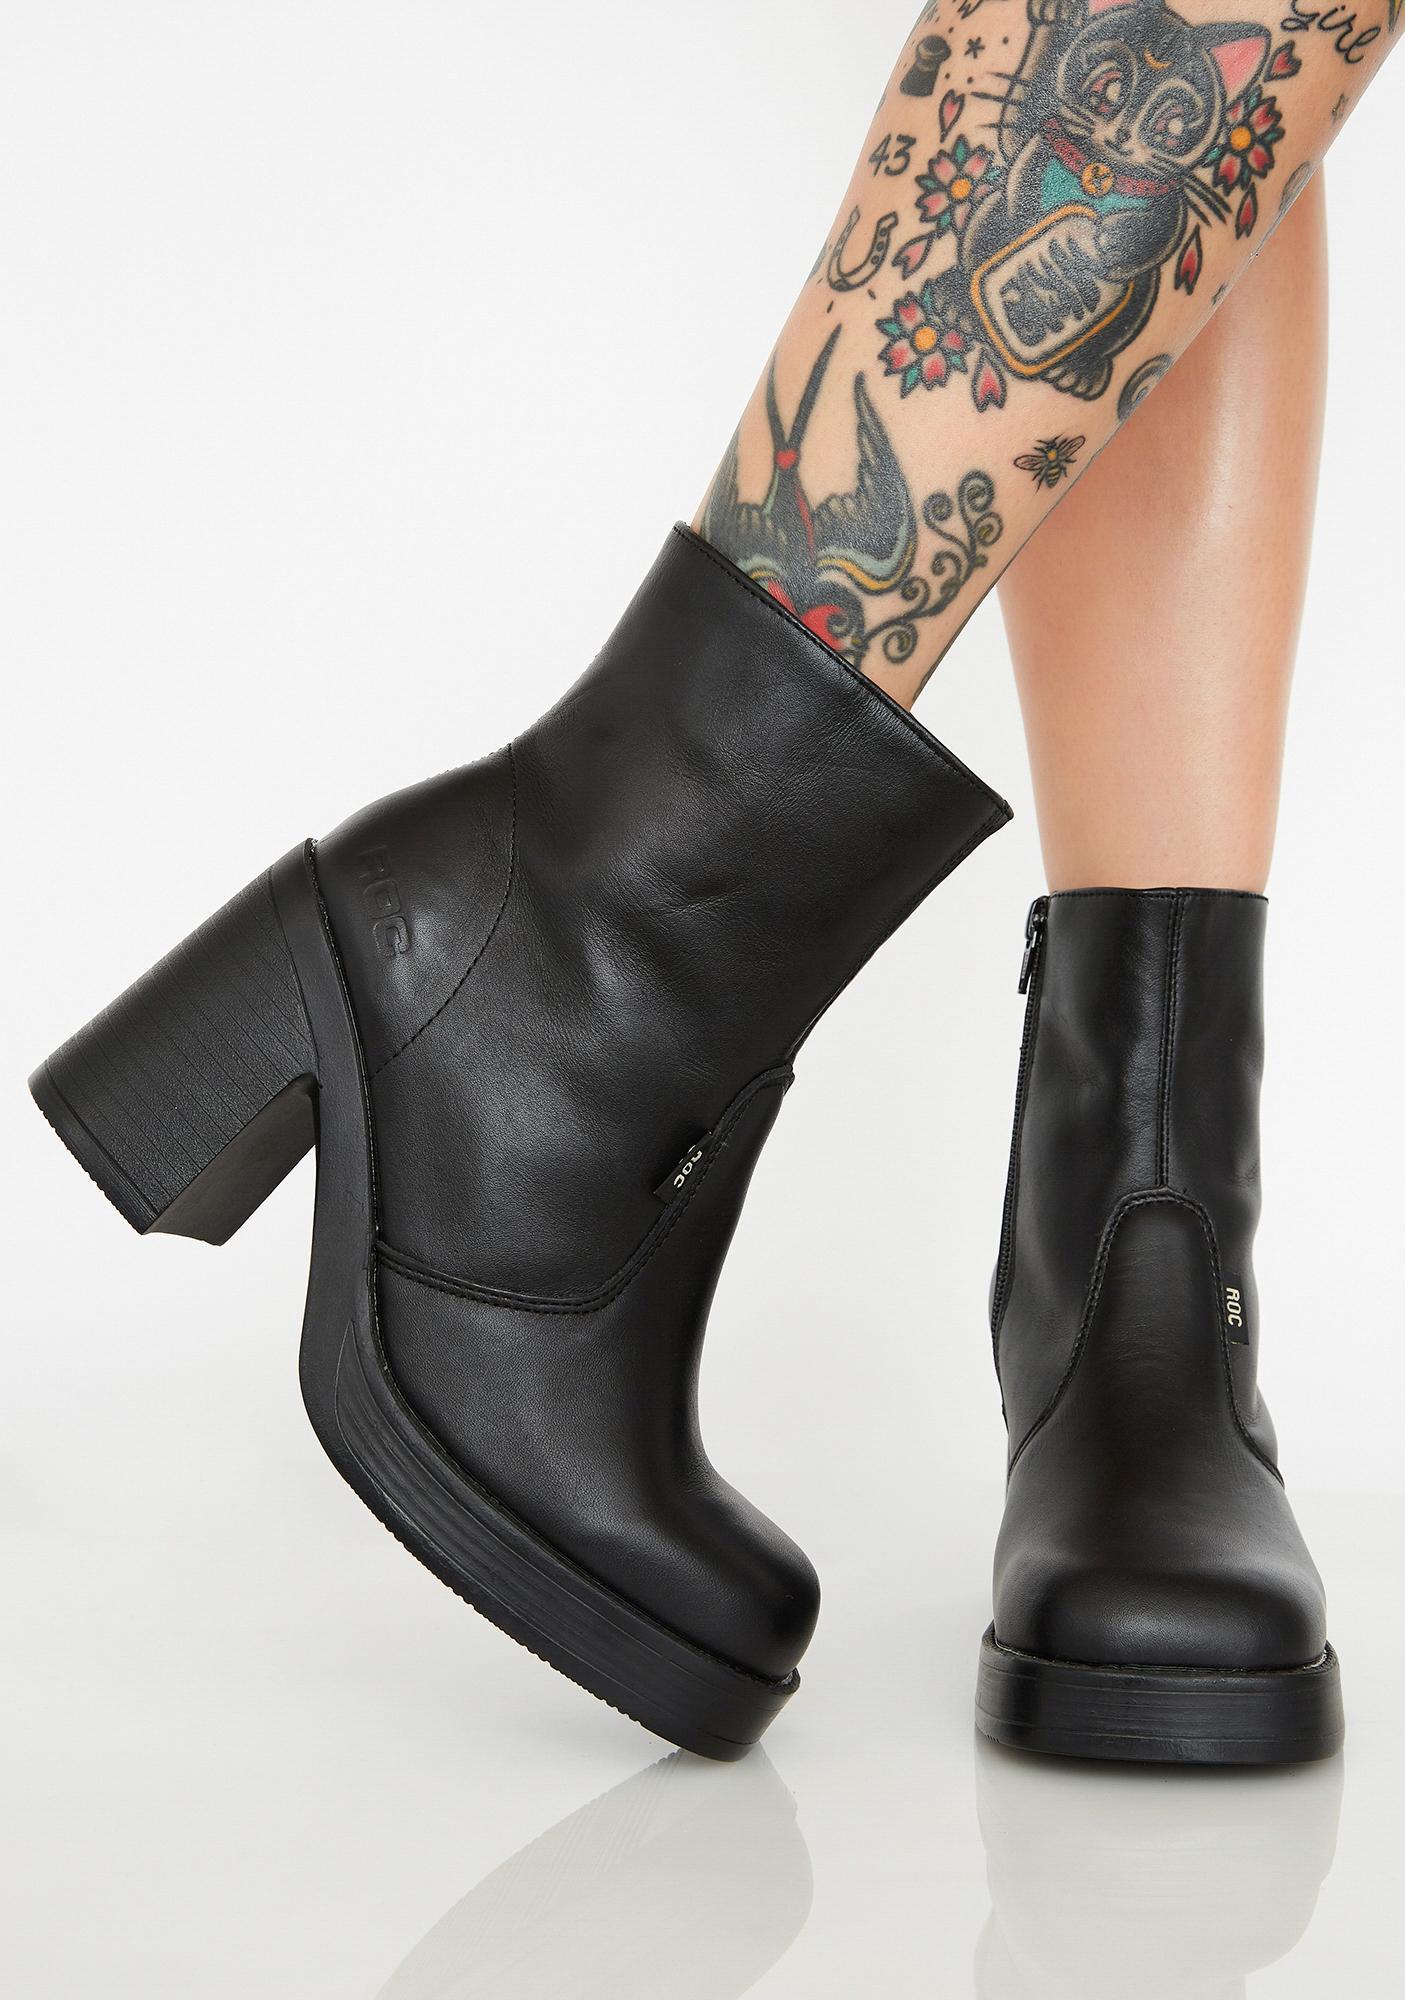 9f277f76b58 ROC Boots Australia Invito Boots | Dolls Kill